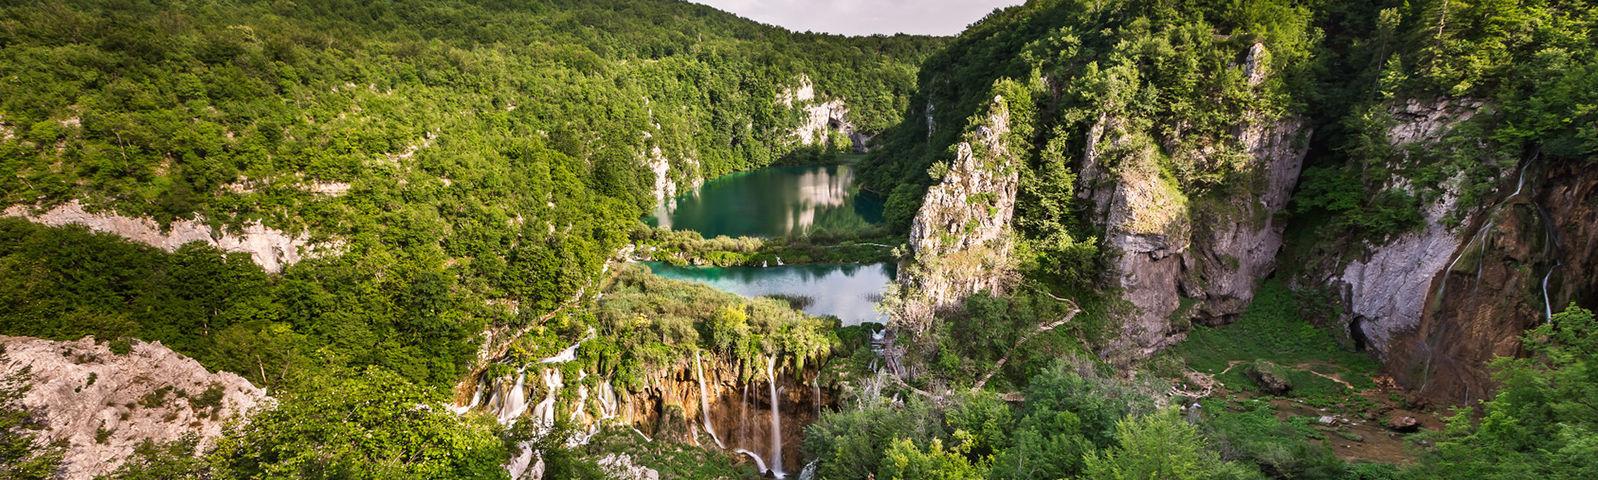 croatie livre guide de voyage